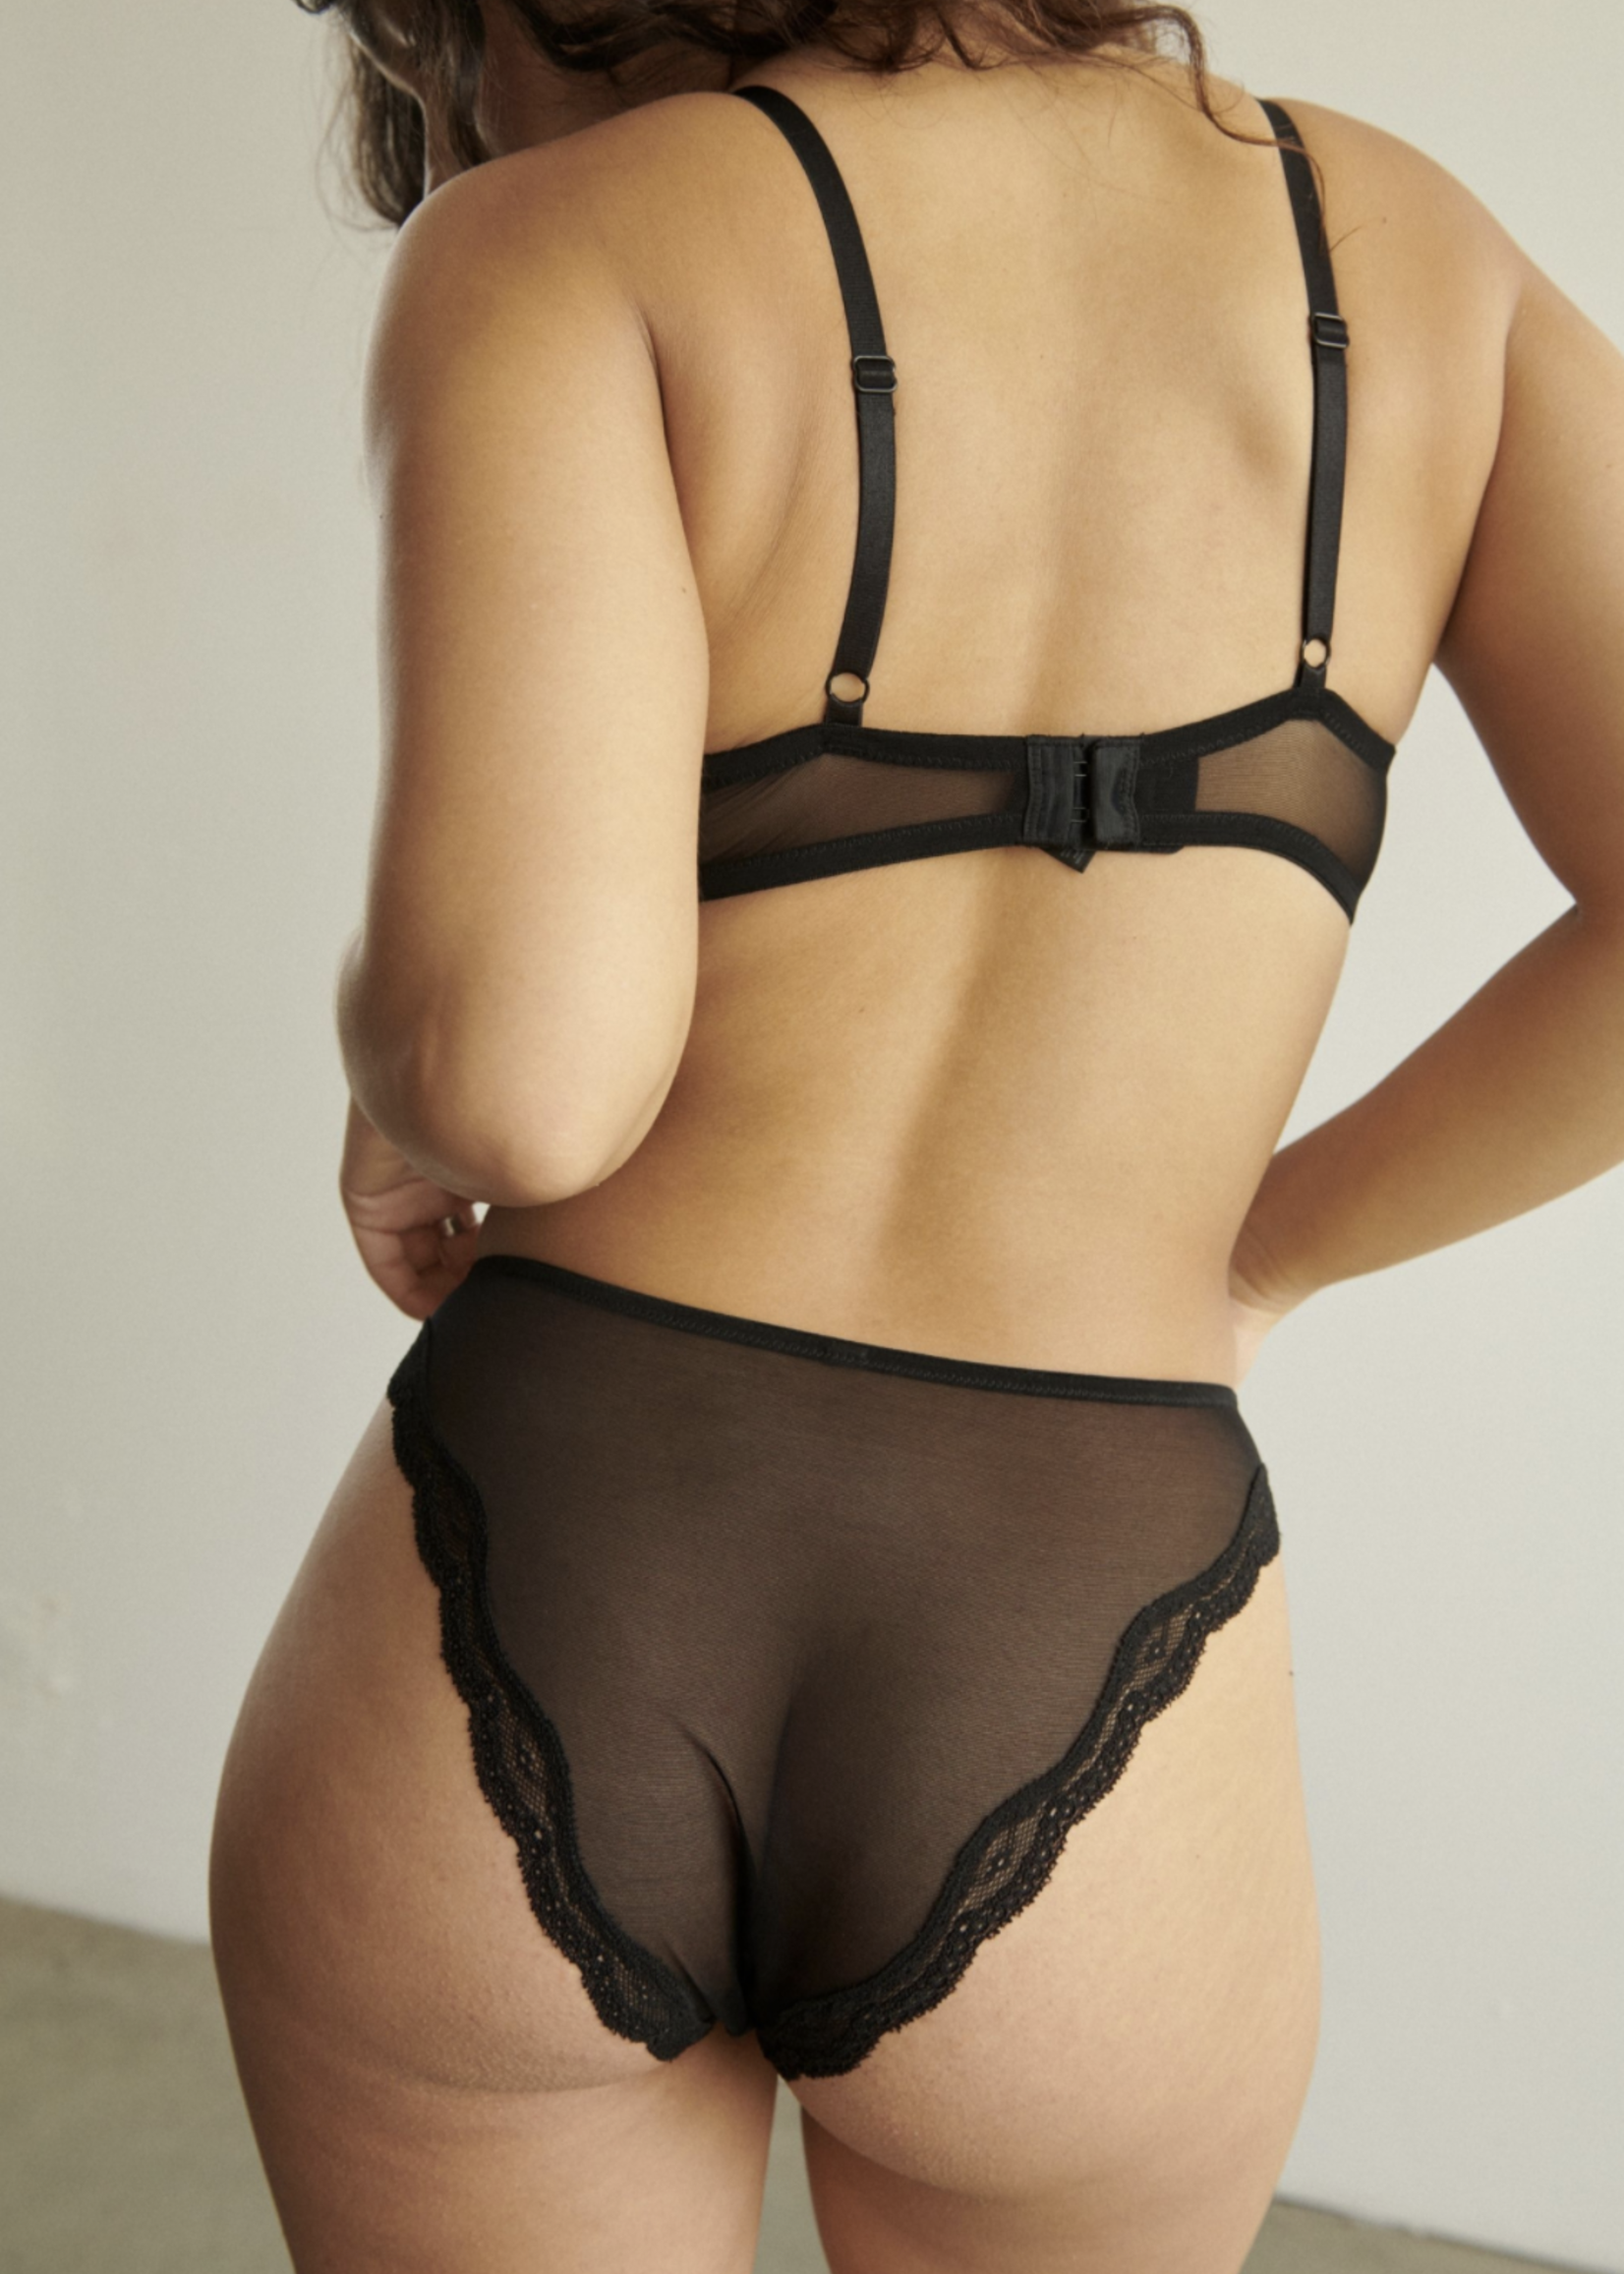 Blush Lingerie Lotus High Leg Bikini Black by Blush Lingerie